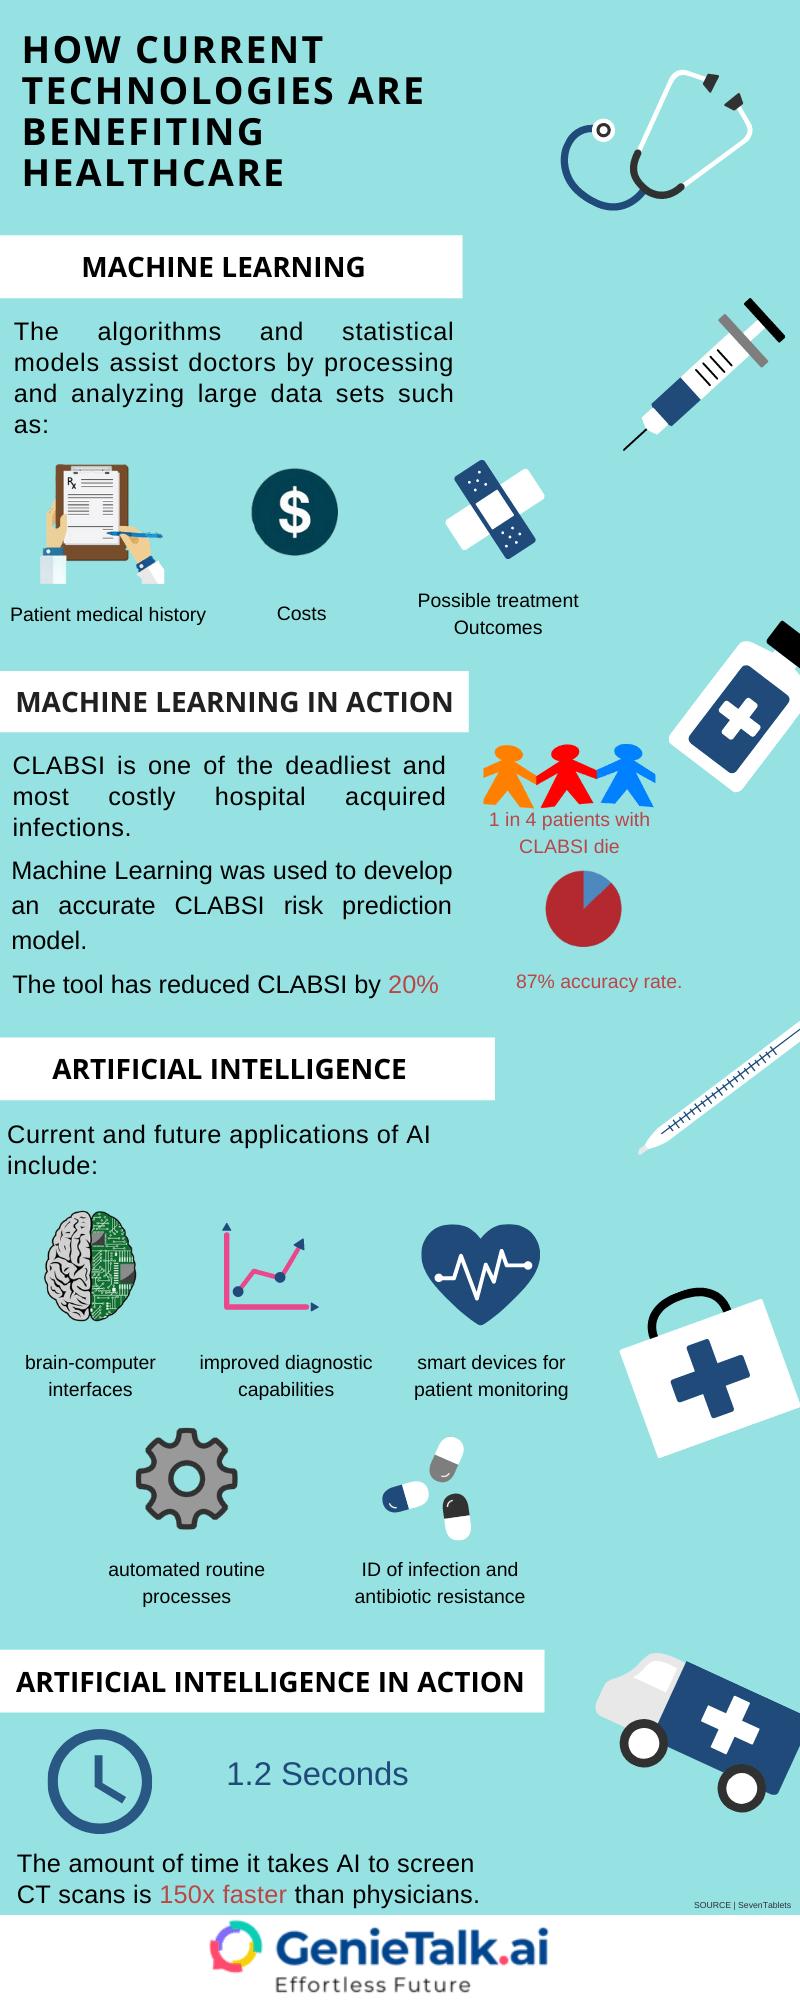 Role of AI in healthcare